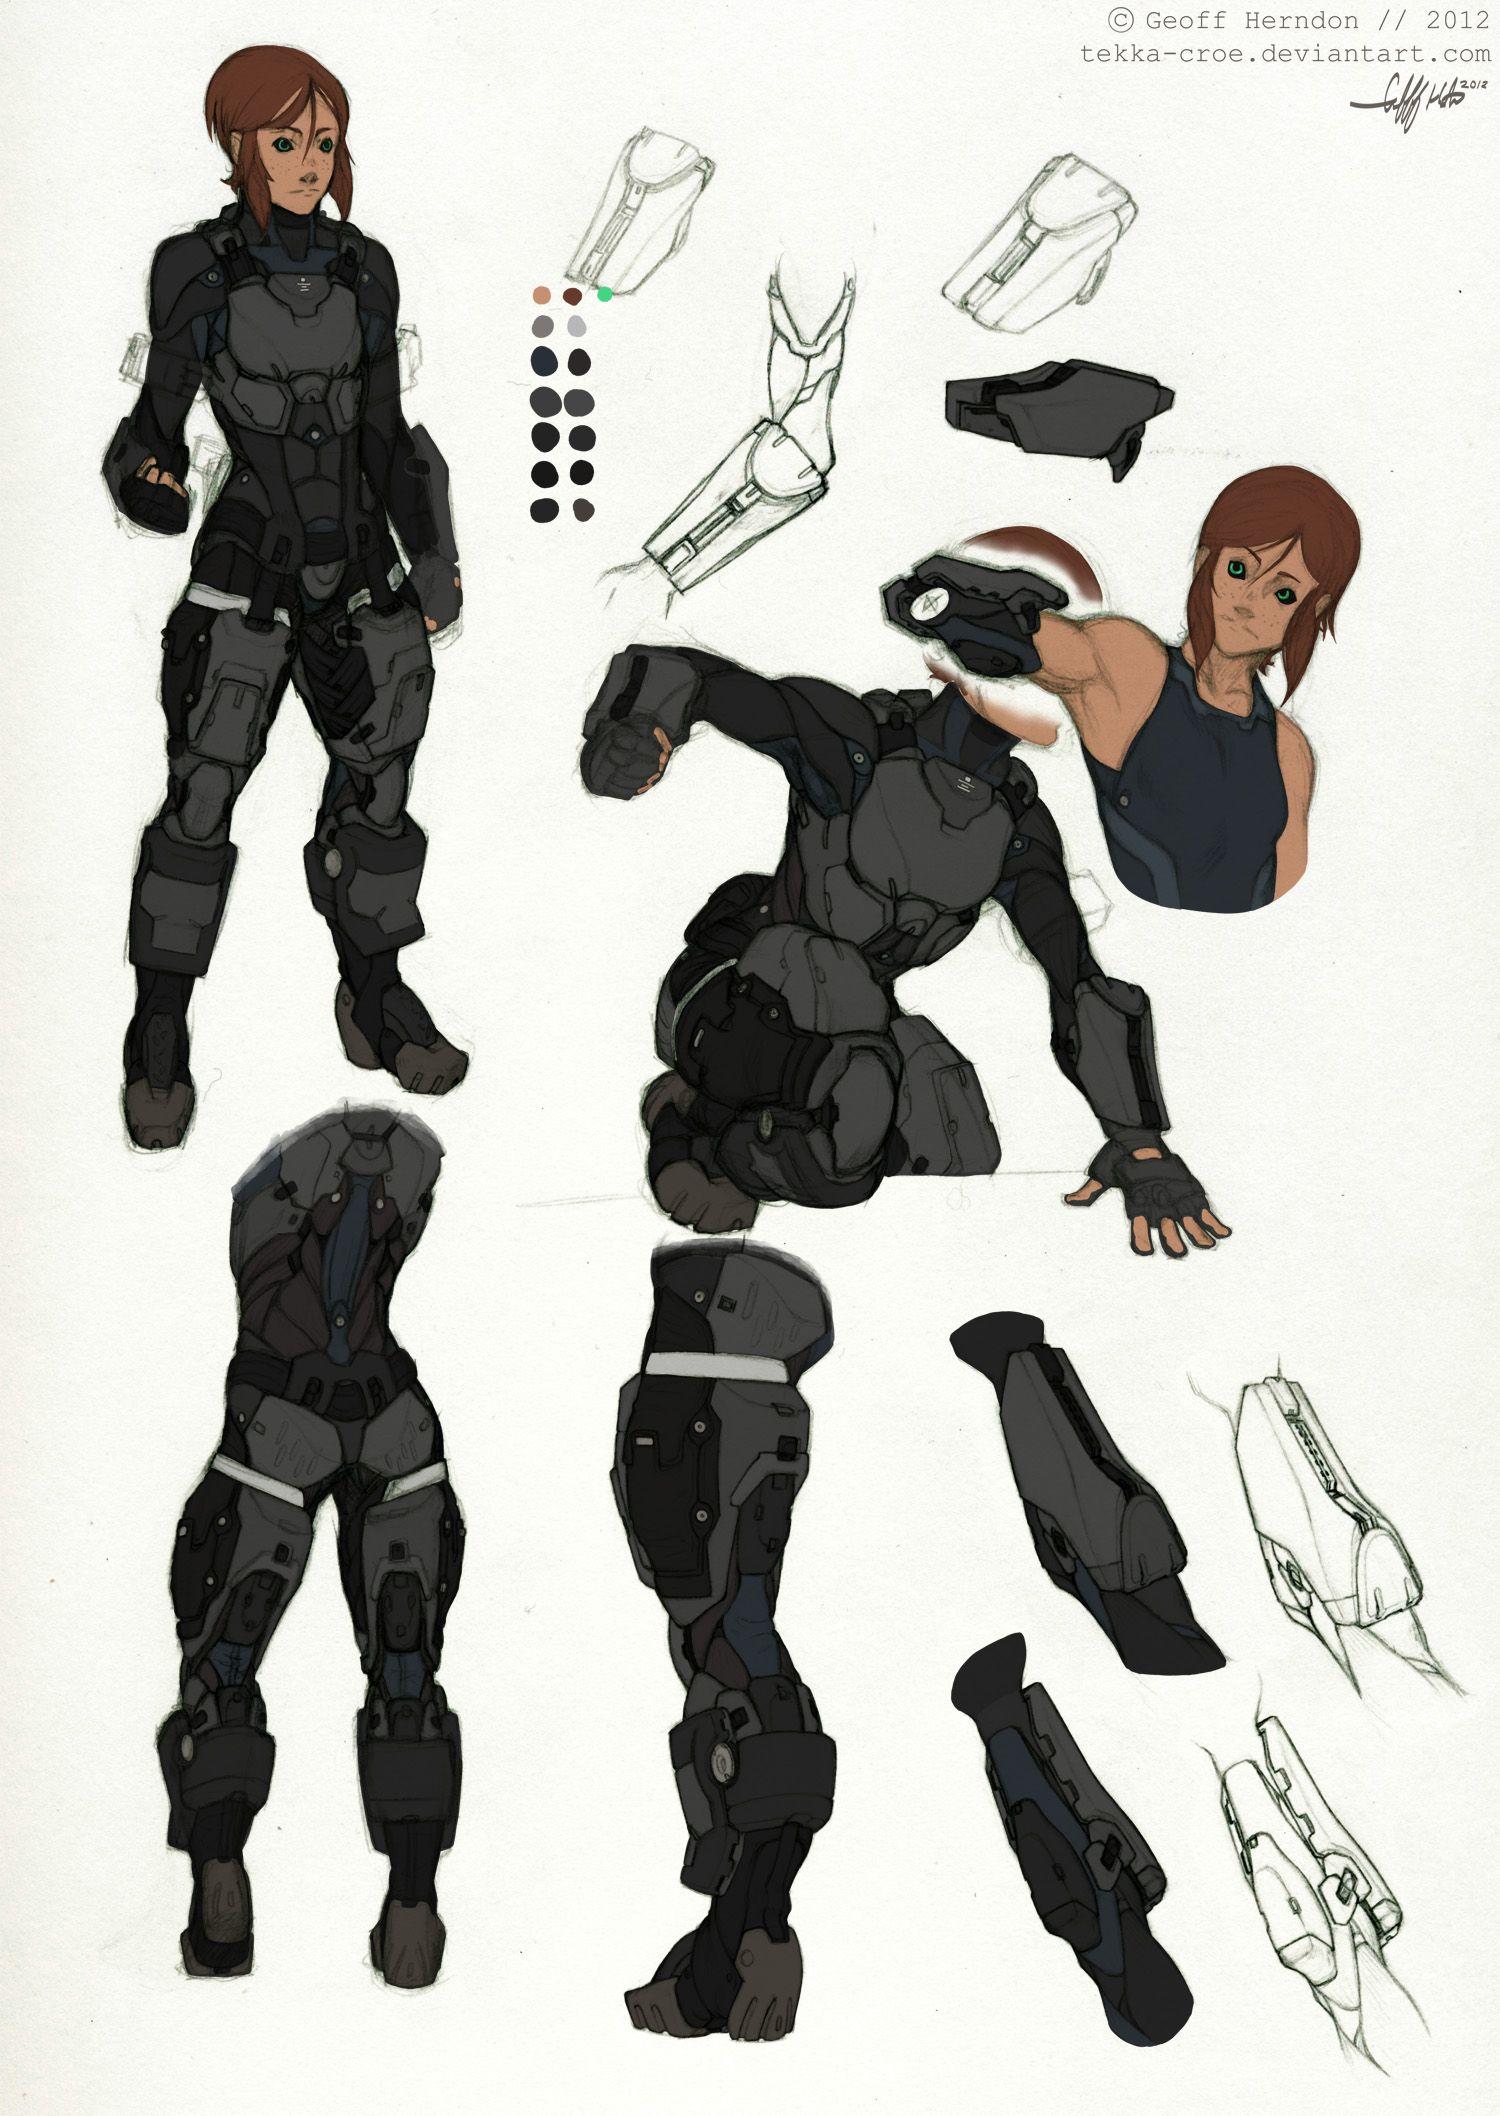 Ballistic Character Design Pdf : Reina armor studies by tekka croe viantart on